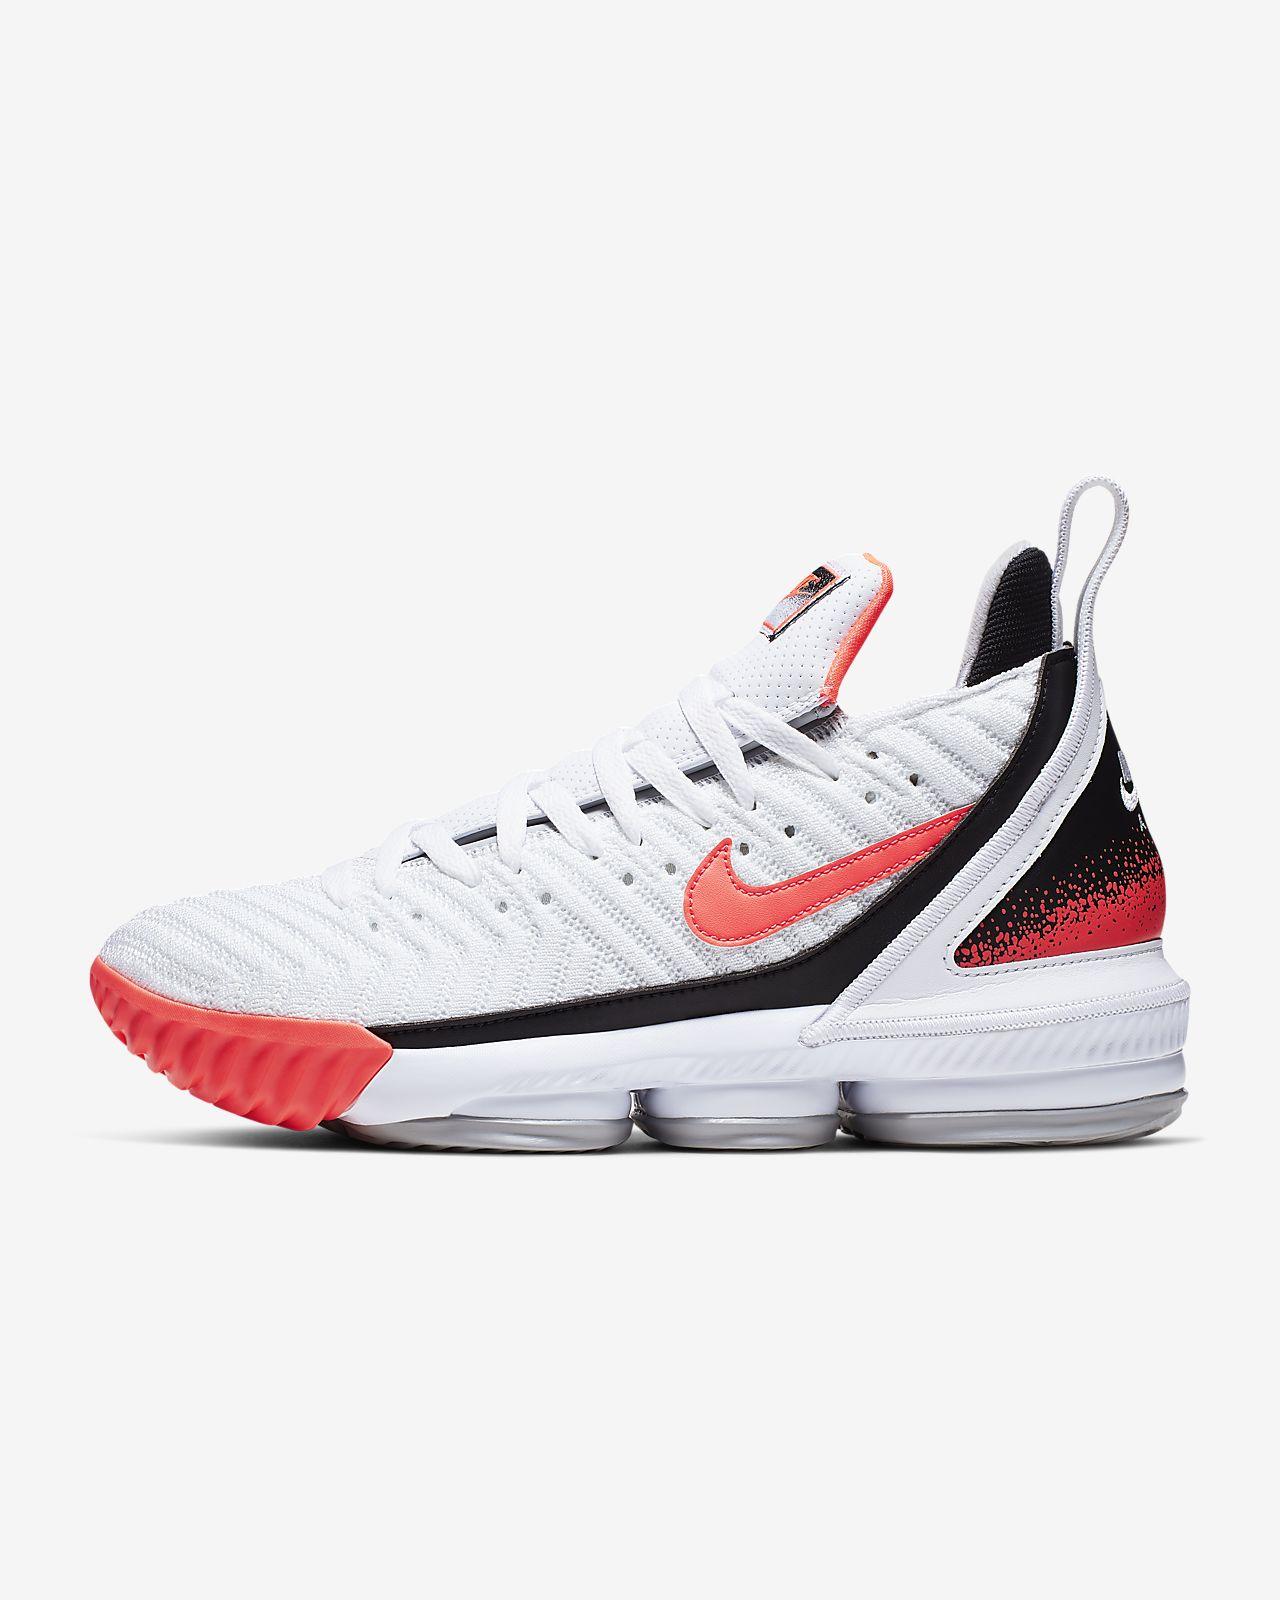 c5ae9caec33 LeBron XVI Hot Lava White Basketball Shoe. Nike.com